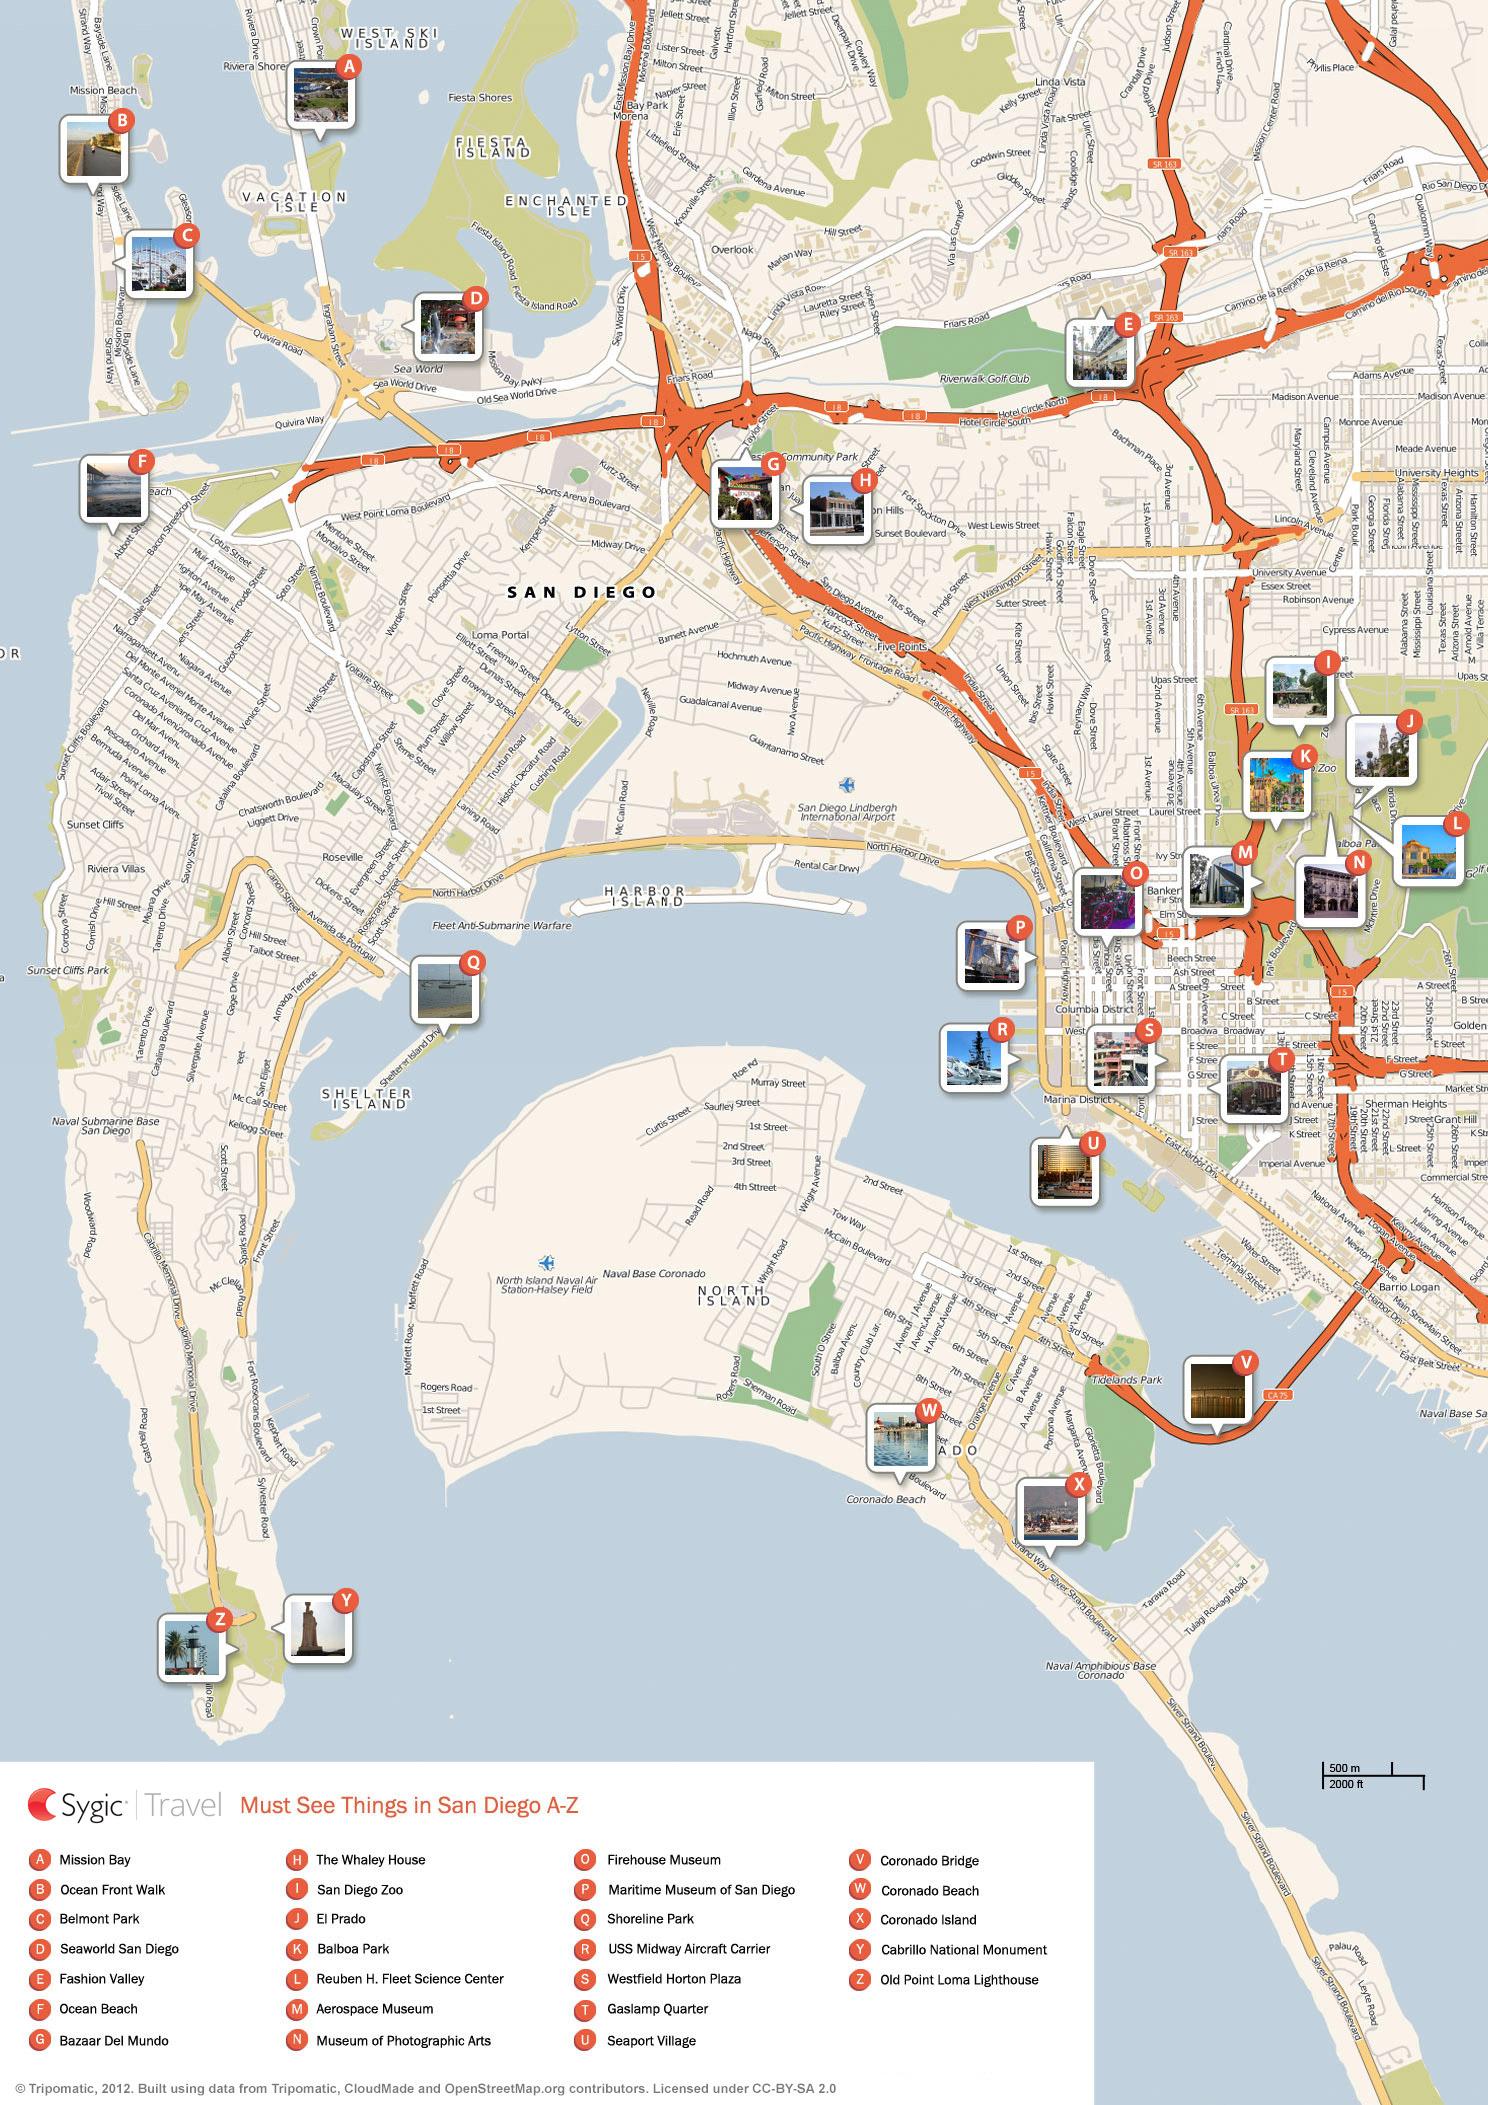 San Diego Printable Tourist Map | Sygic Travel - San Diego Attractions Map Printable